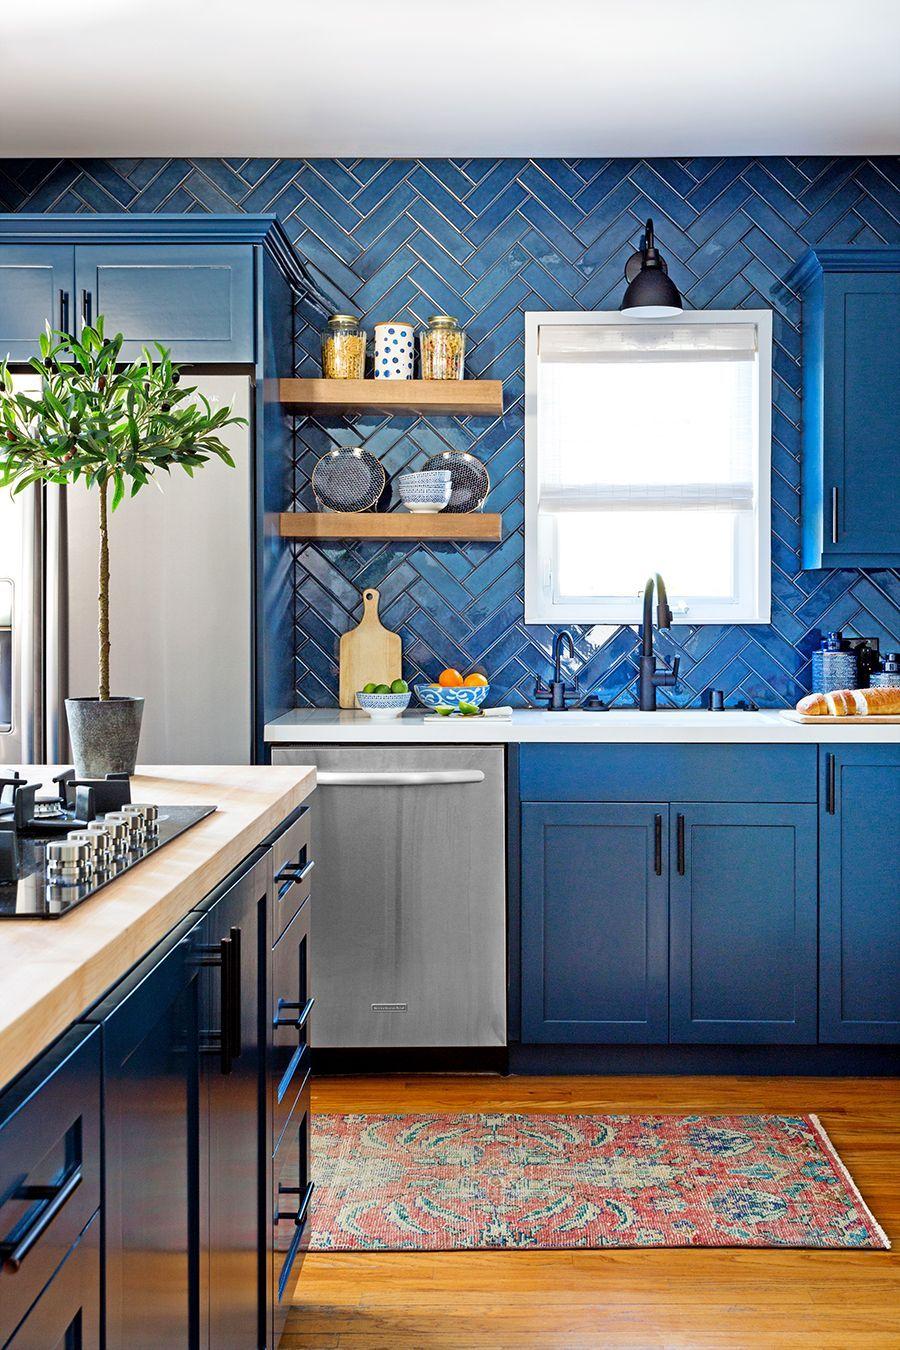 Checkout Newness Kitchen Backsplash Designs 2018 Modern Kitchen Cabinets Kitchen Backsplash Designs Kitchen Cabinet Design